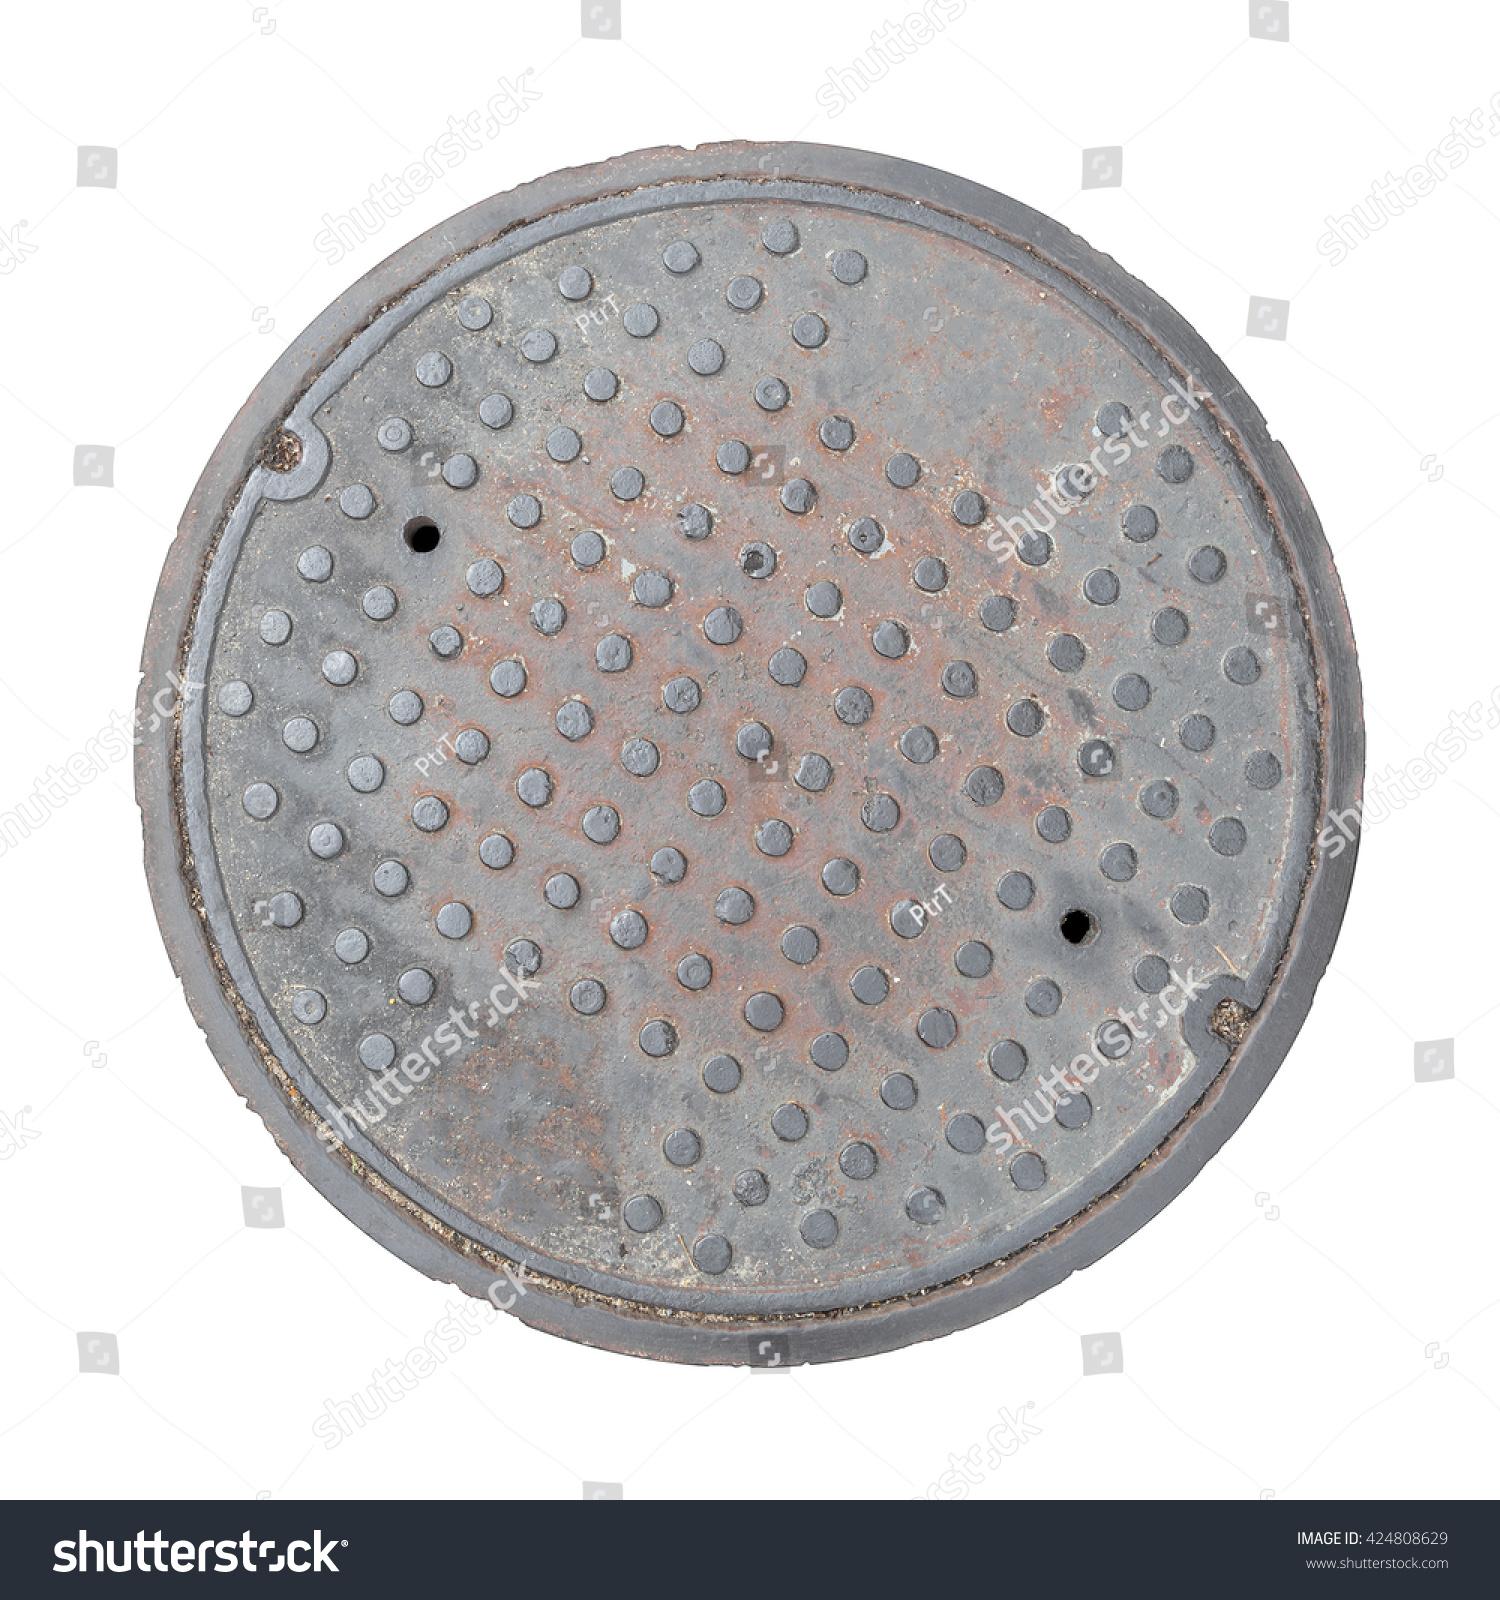 Rusty grunge manhole cover ROUGH edge rim isolated